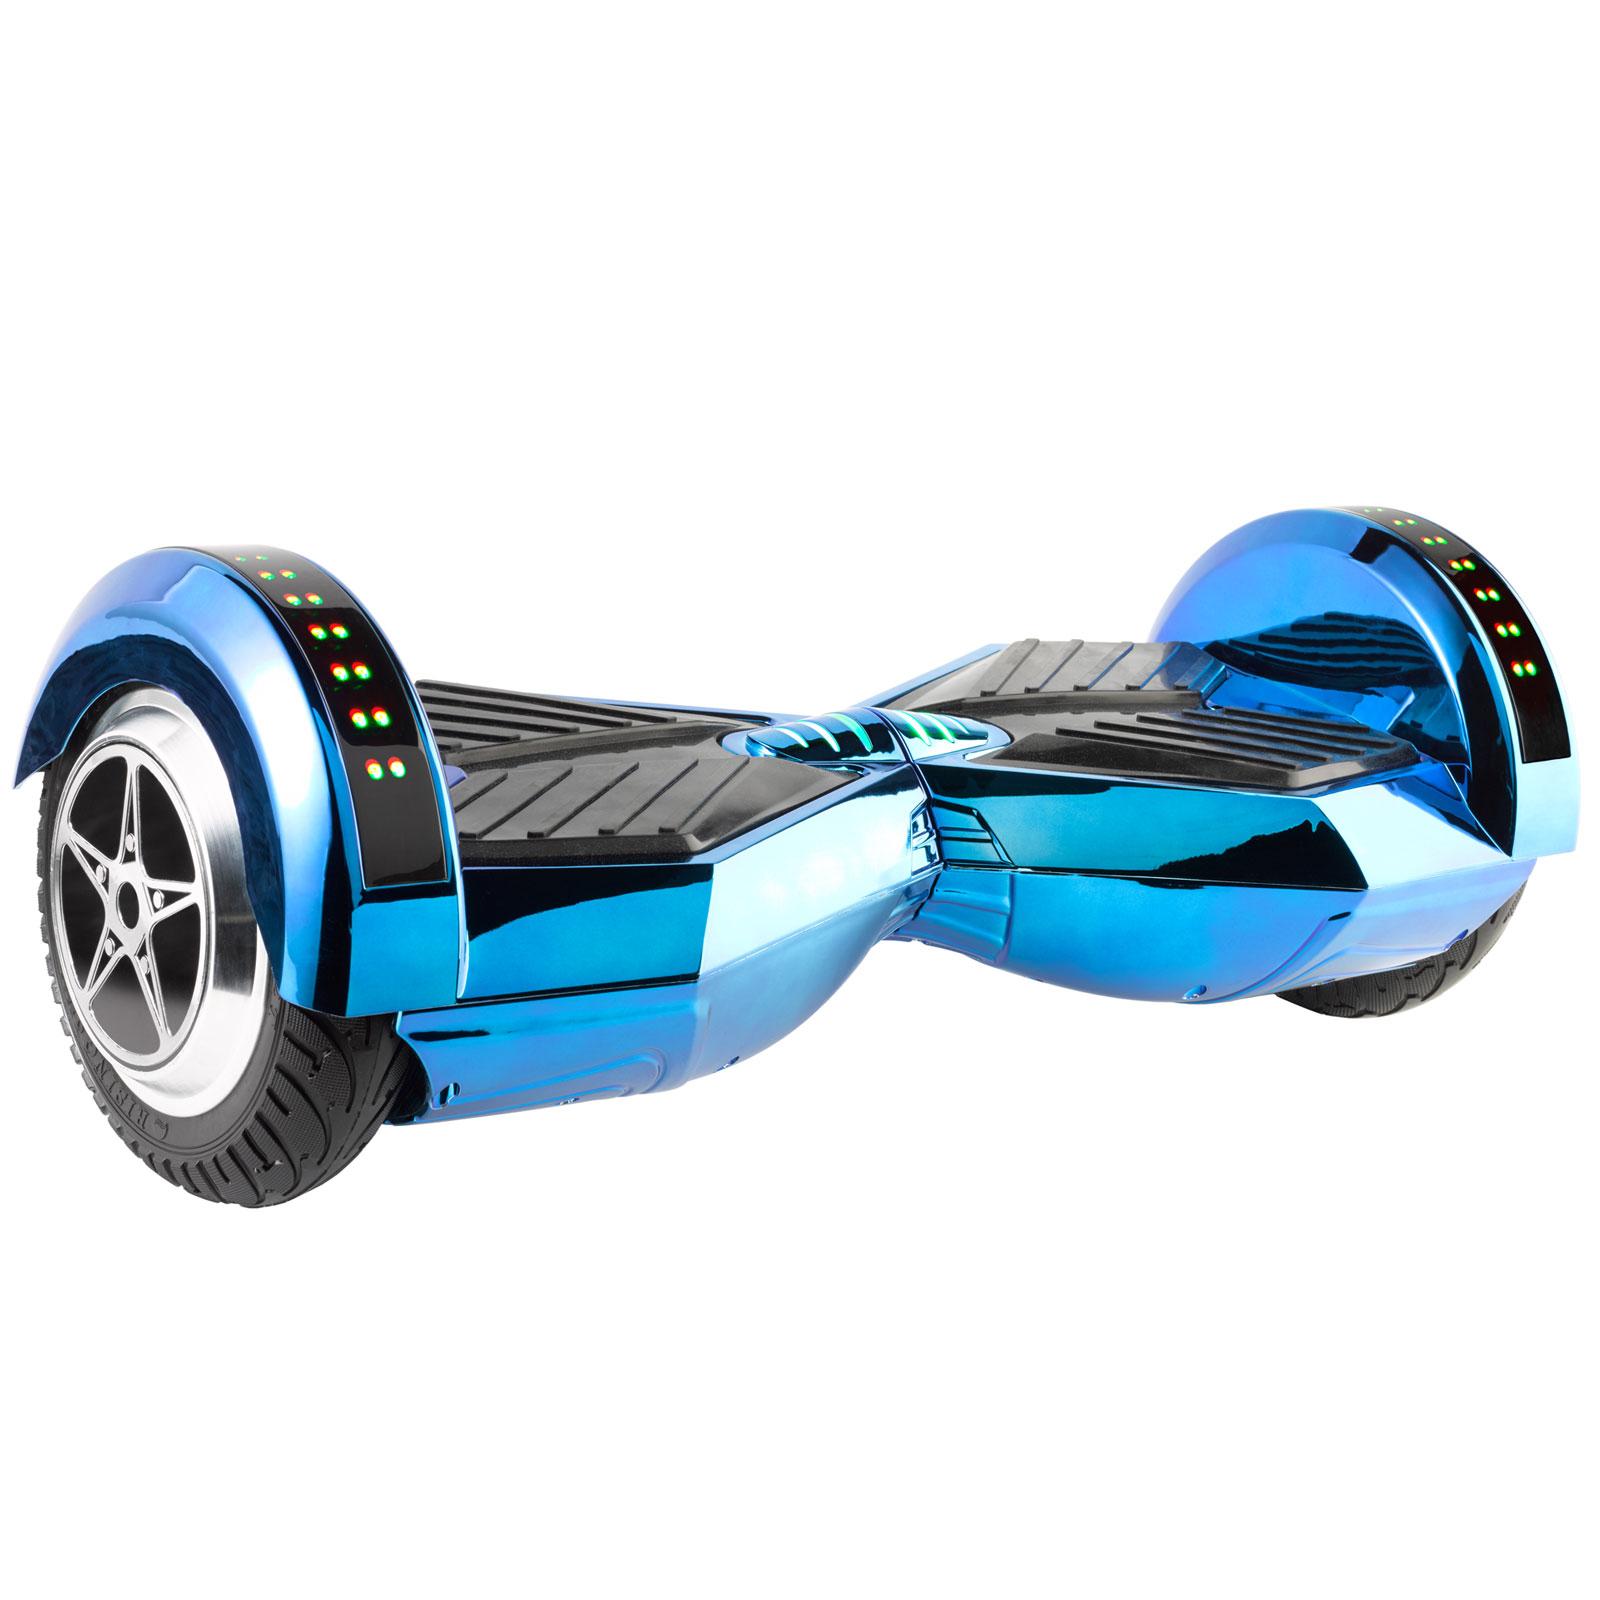 Mpman g2 metallic blue t l commande antivol gyropode for Housse pour hoverboard